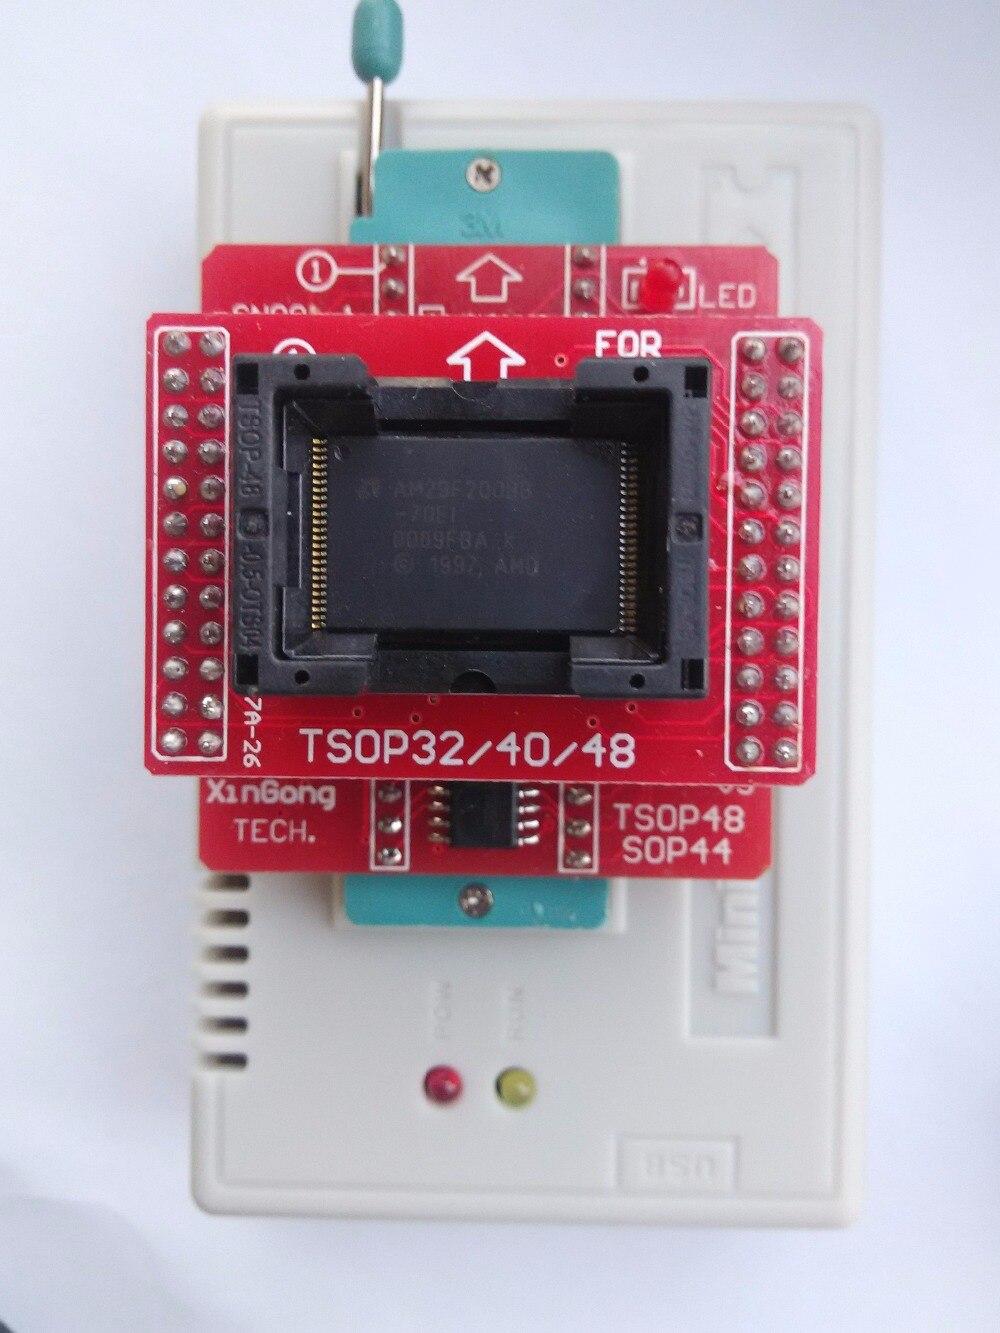 V8 3 XGecu TL866II tl866 ii Plus programmer+24 adapters socket+SOP8 clip  1 8V nand flash 24 93 25 eprom avr mcu Bios program